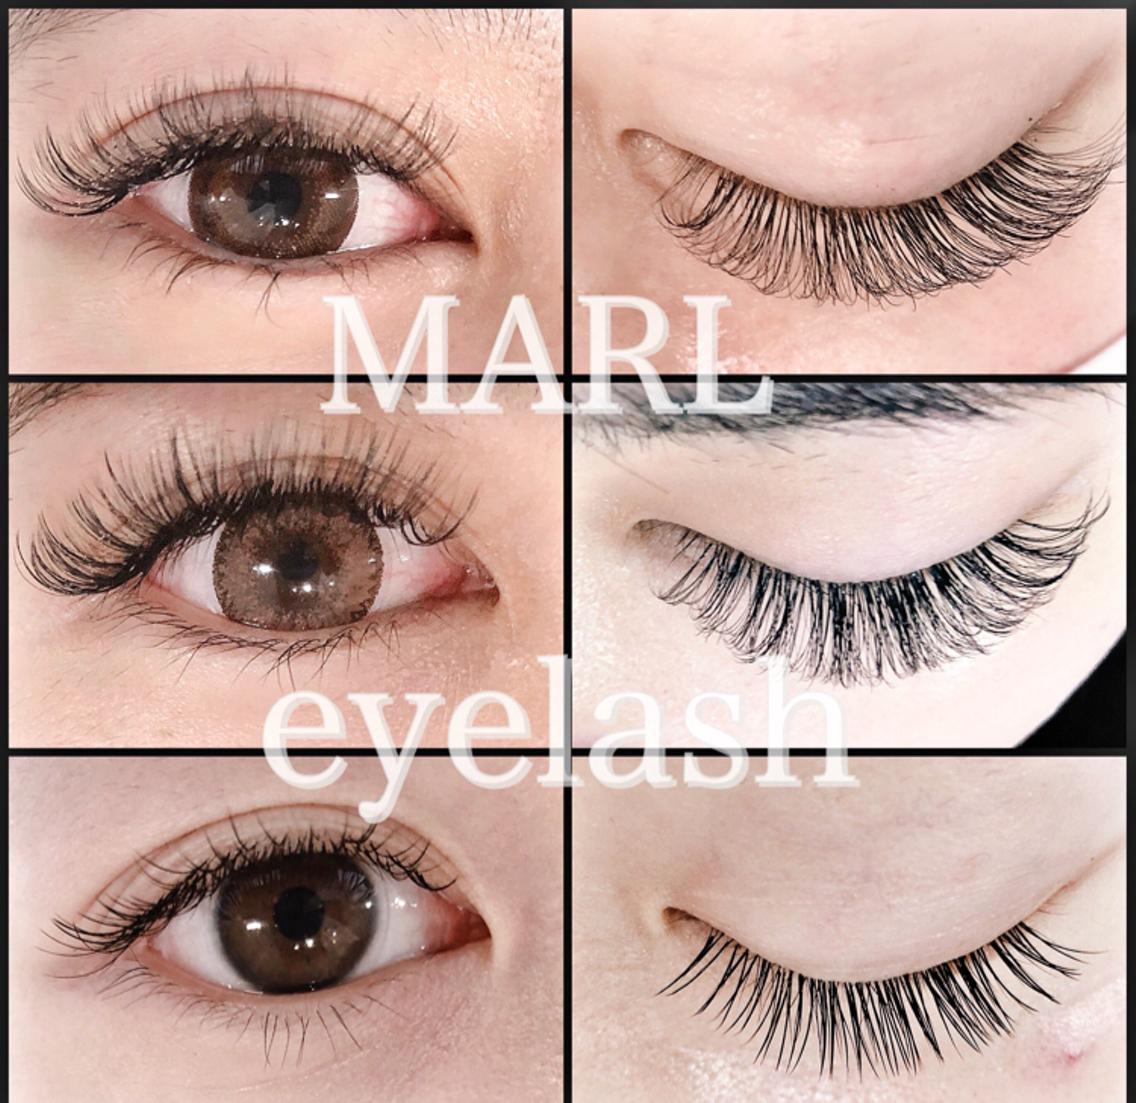 MARL eyelash所属・小嶋千穂の掲載